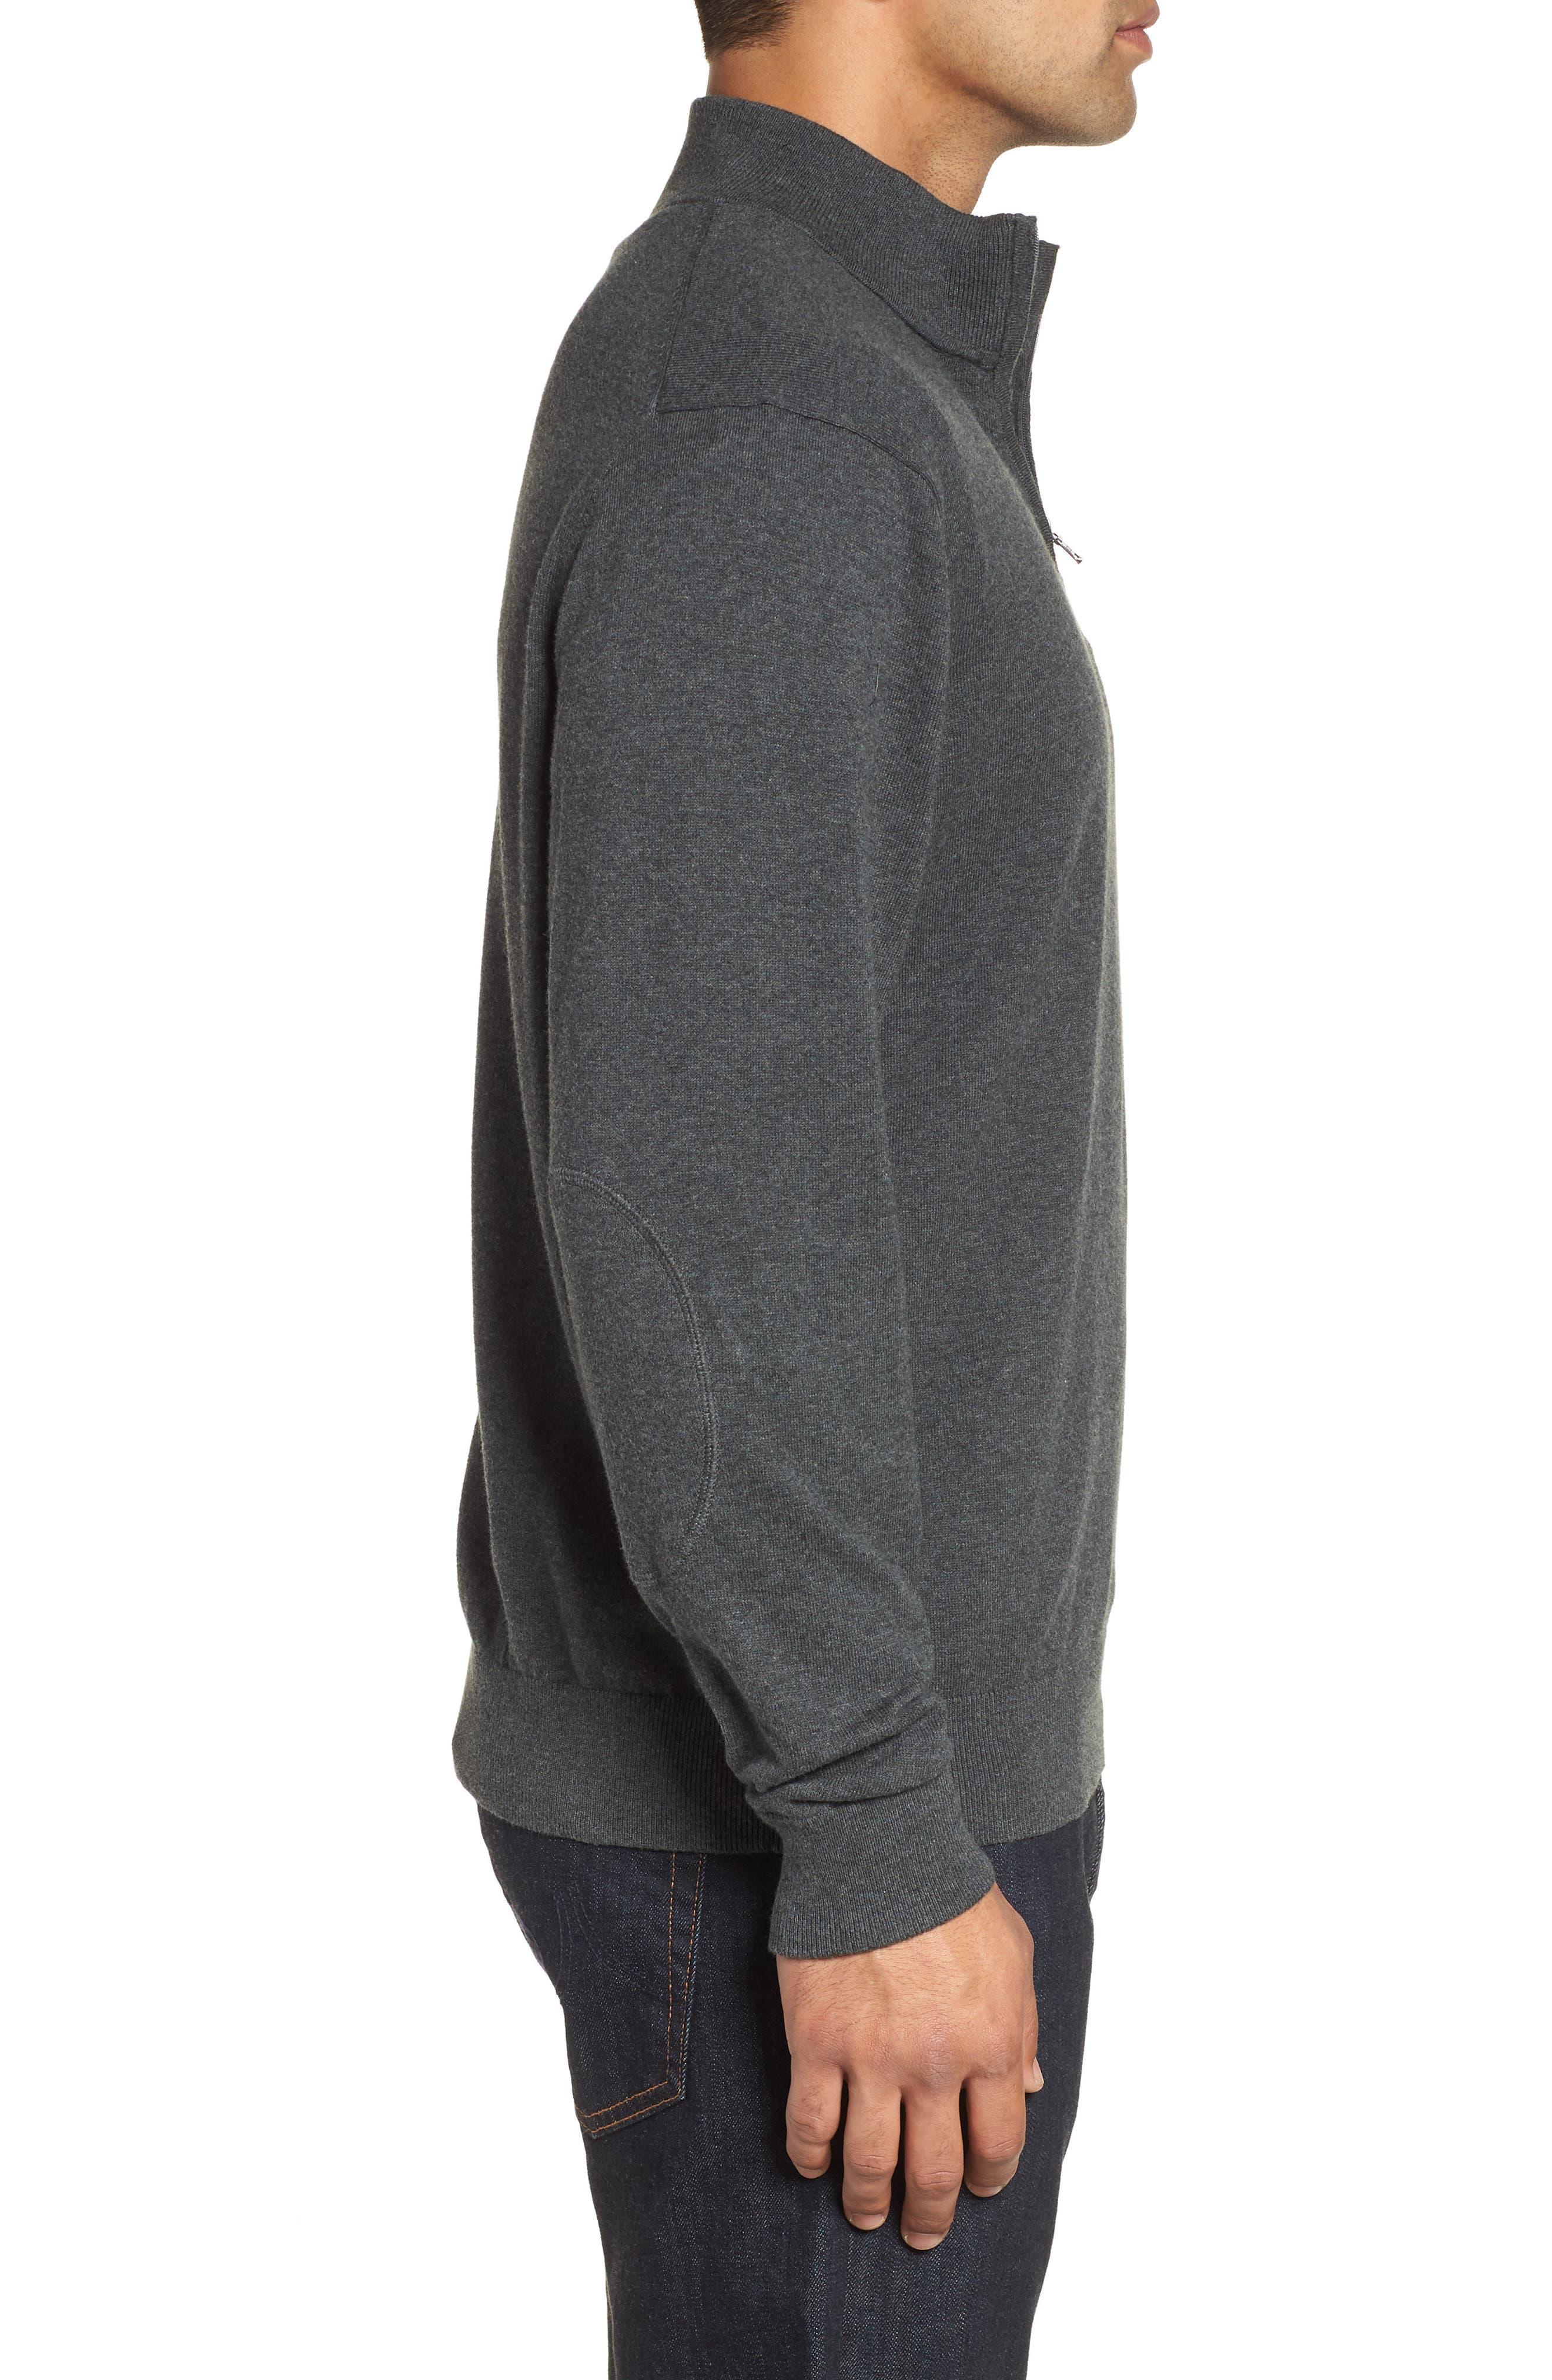 Los Angeles Rams - Lakemont Regular Fit Quarter Zip Sweater,                             Alternate thumbnail 3, color,                             CHARCOAL HEATHER